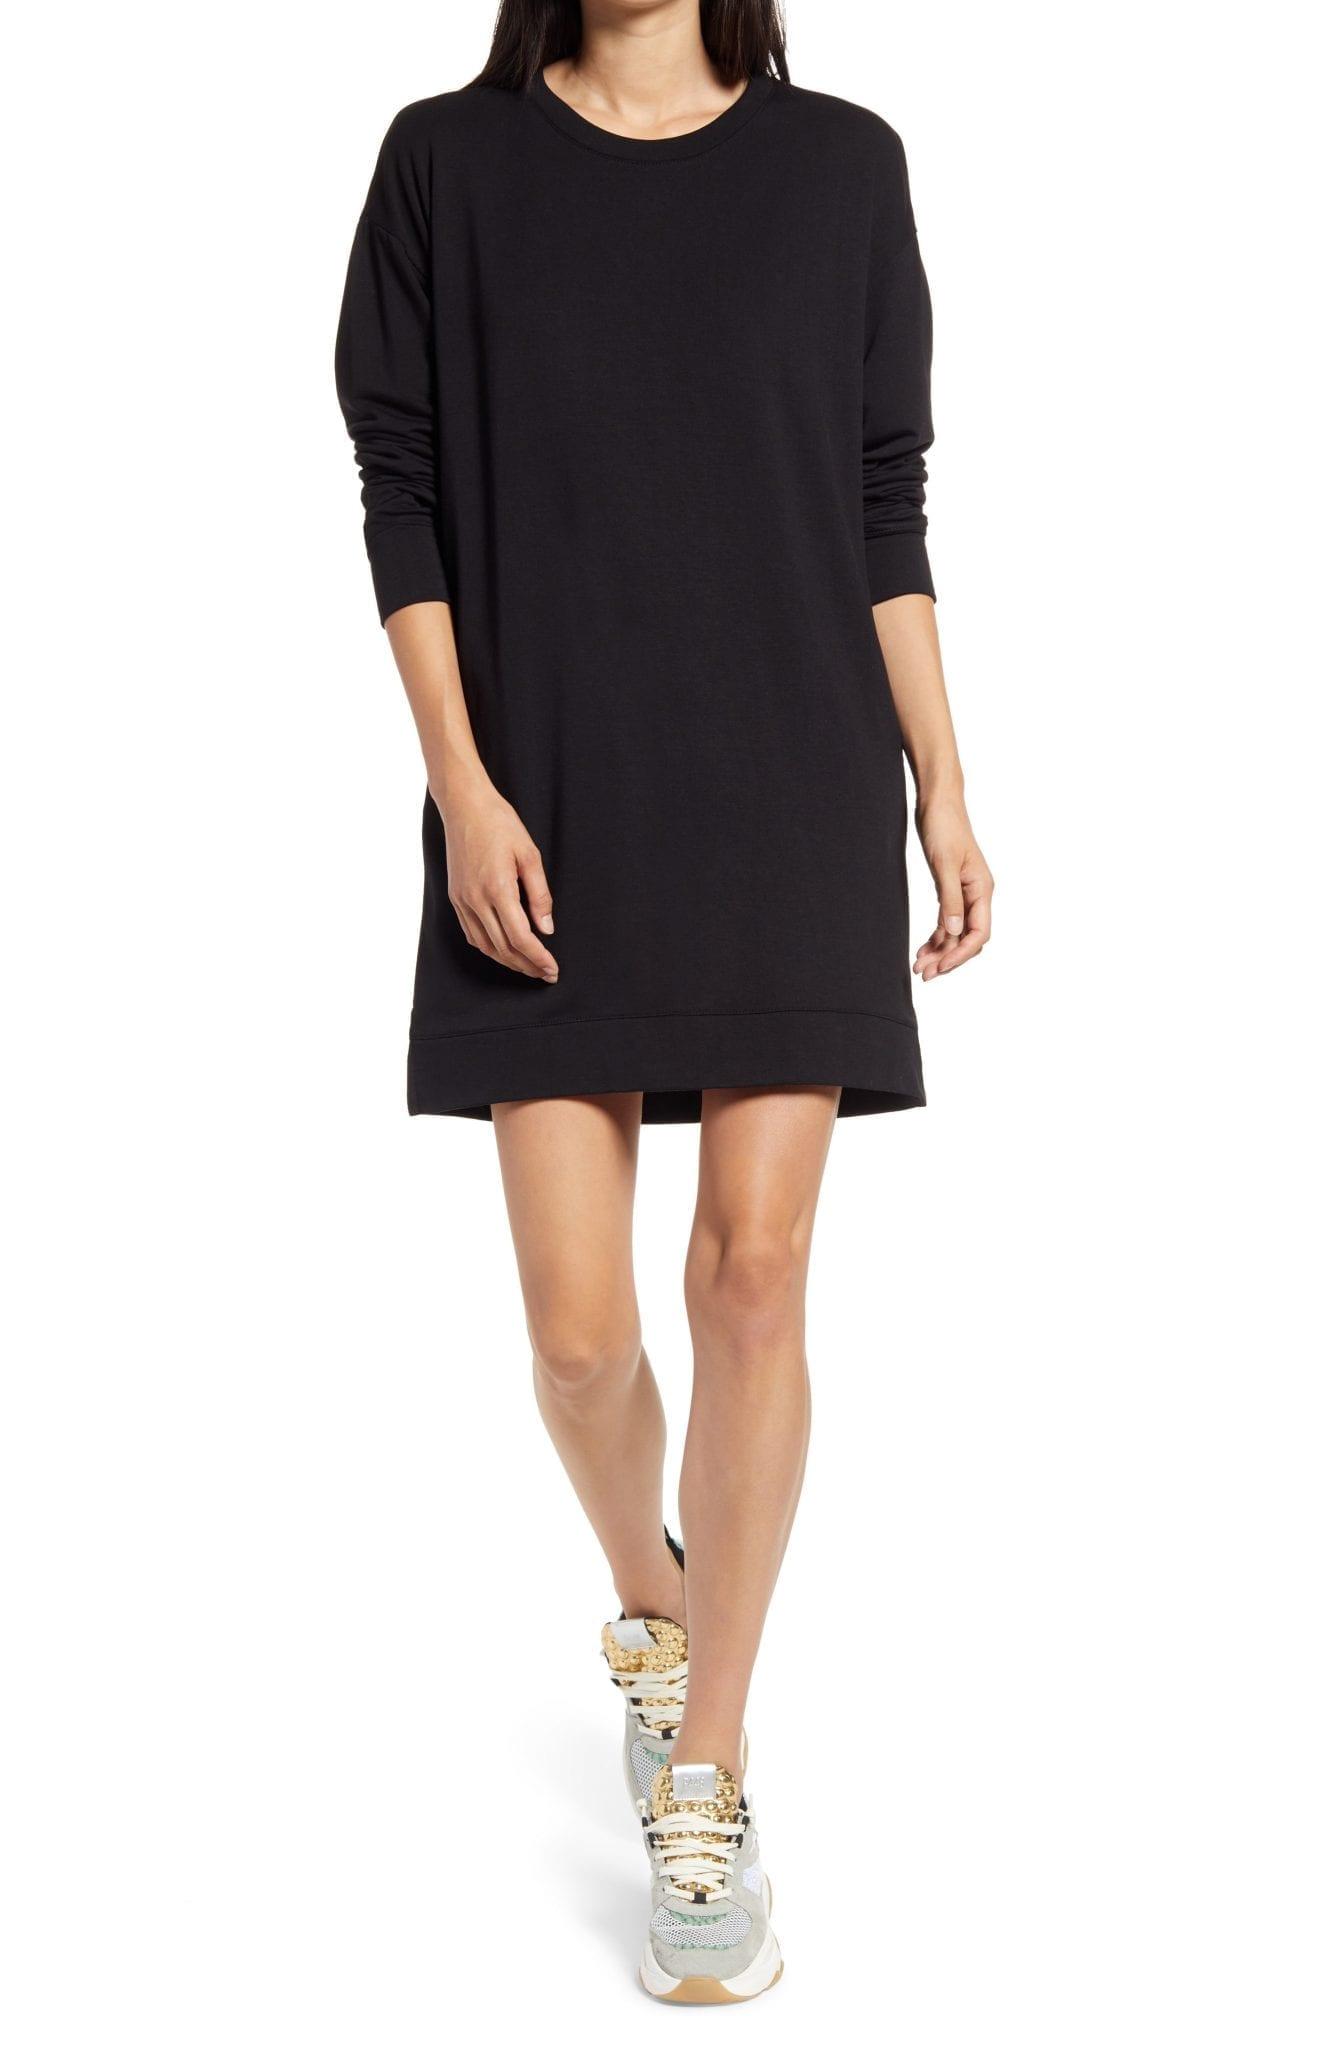 SOCIALITE Long Sleeve Sweatshirt Mini Dress